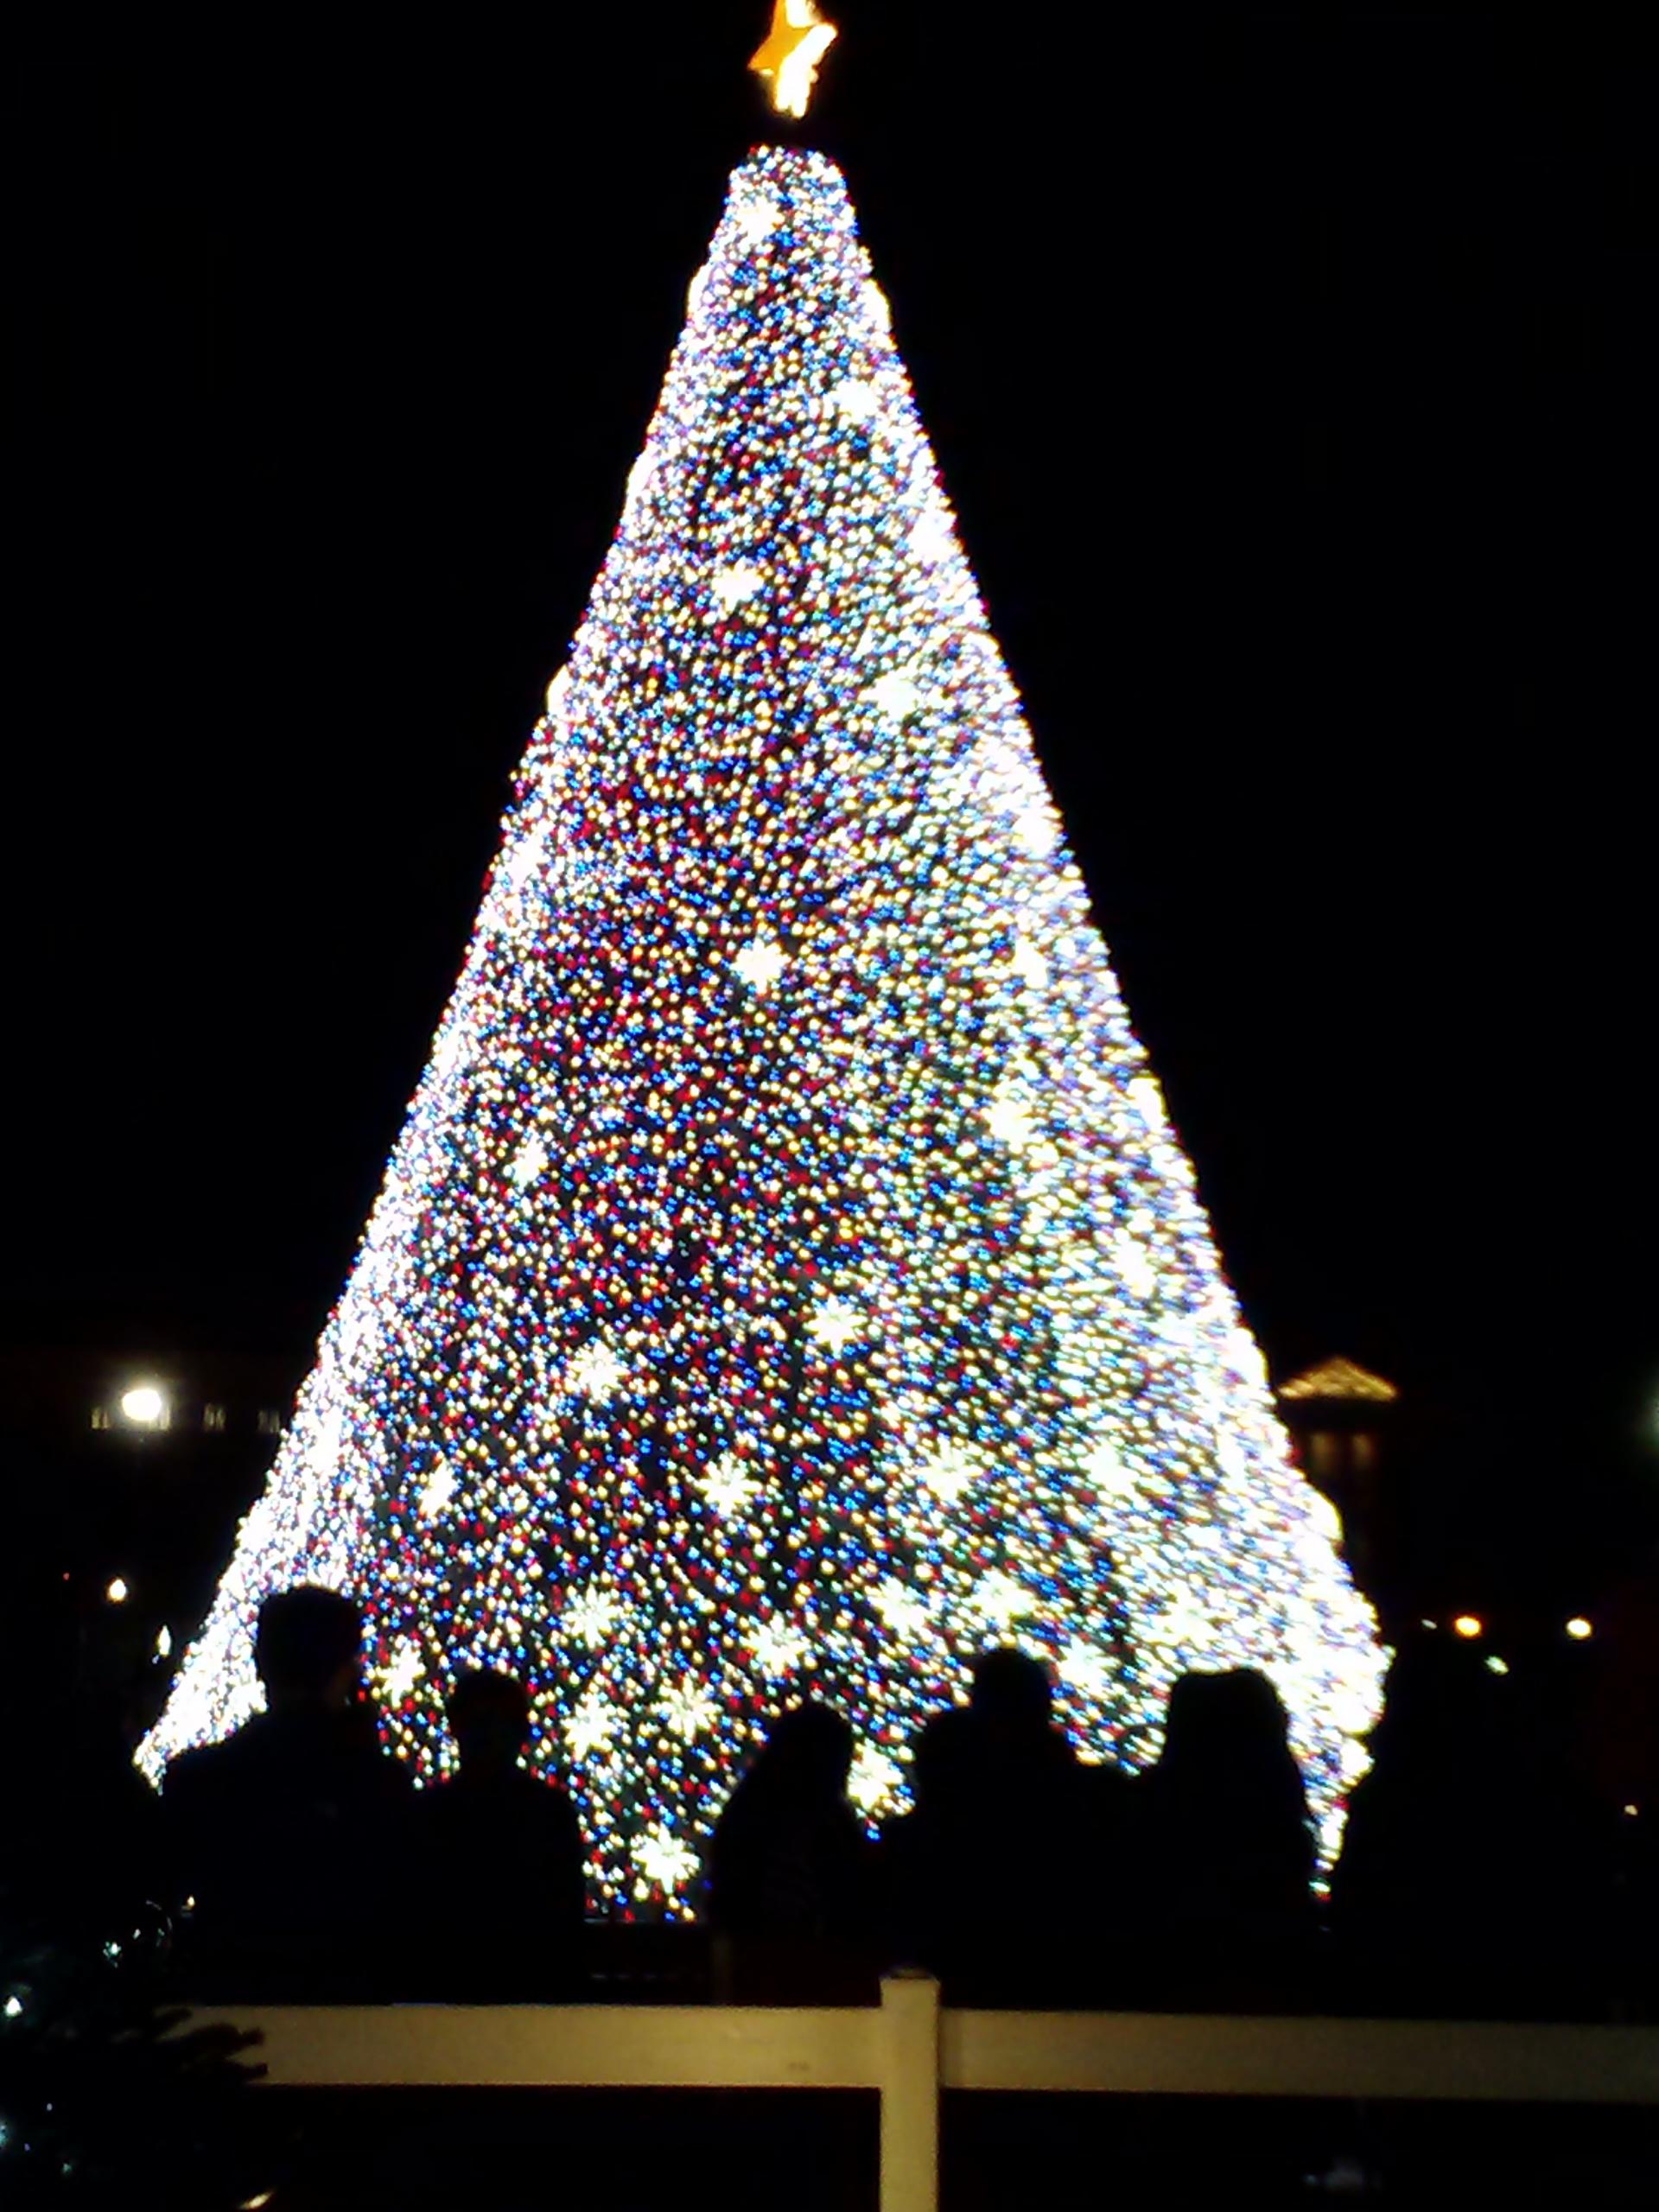 U.S. National Christmas Tree on December 25, 2016